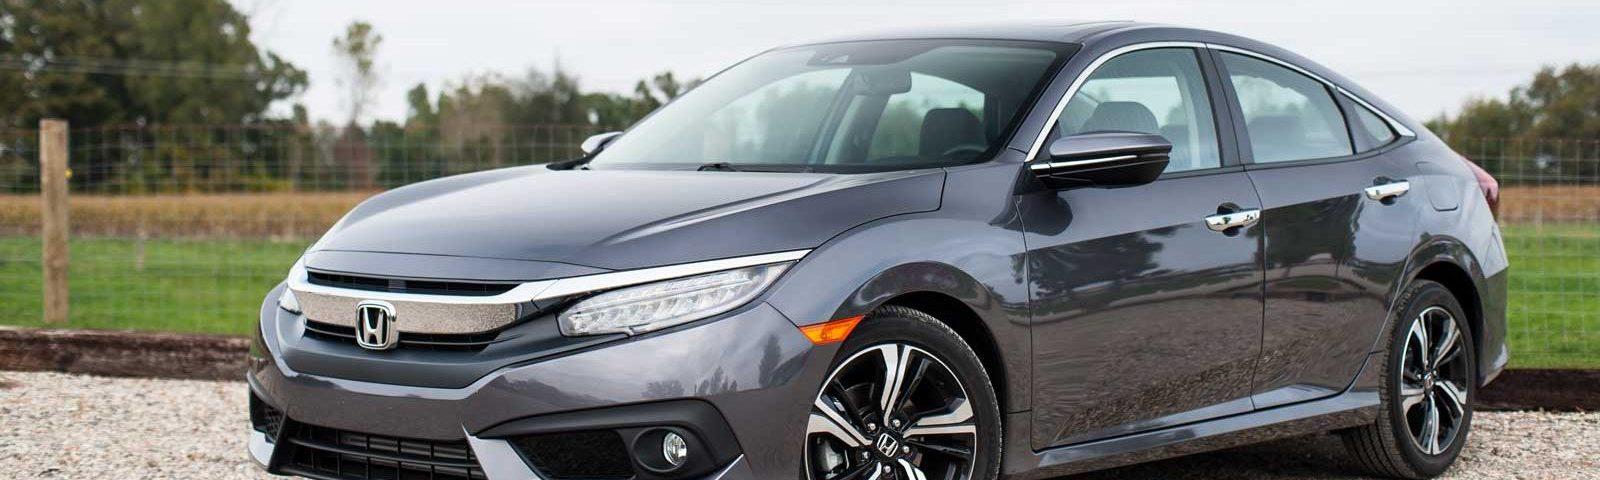 New Honda Civic 2016